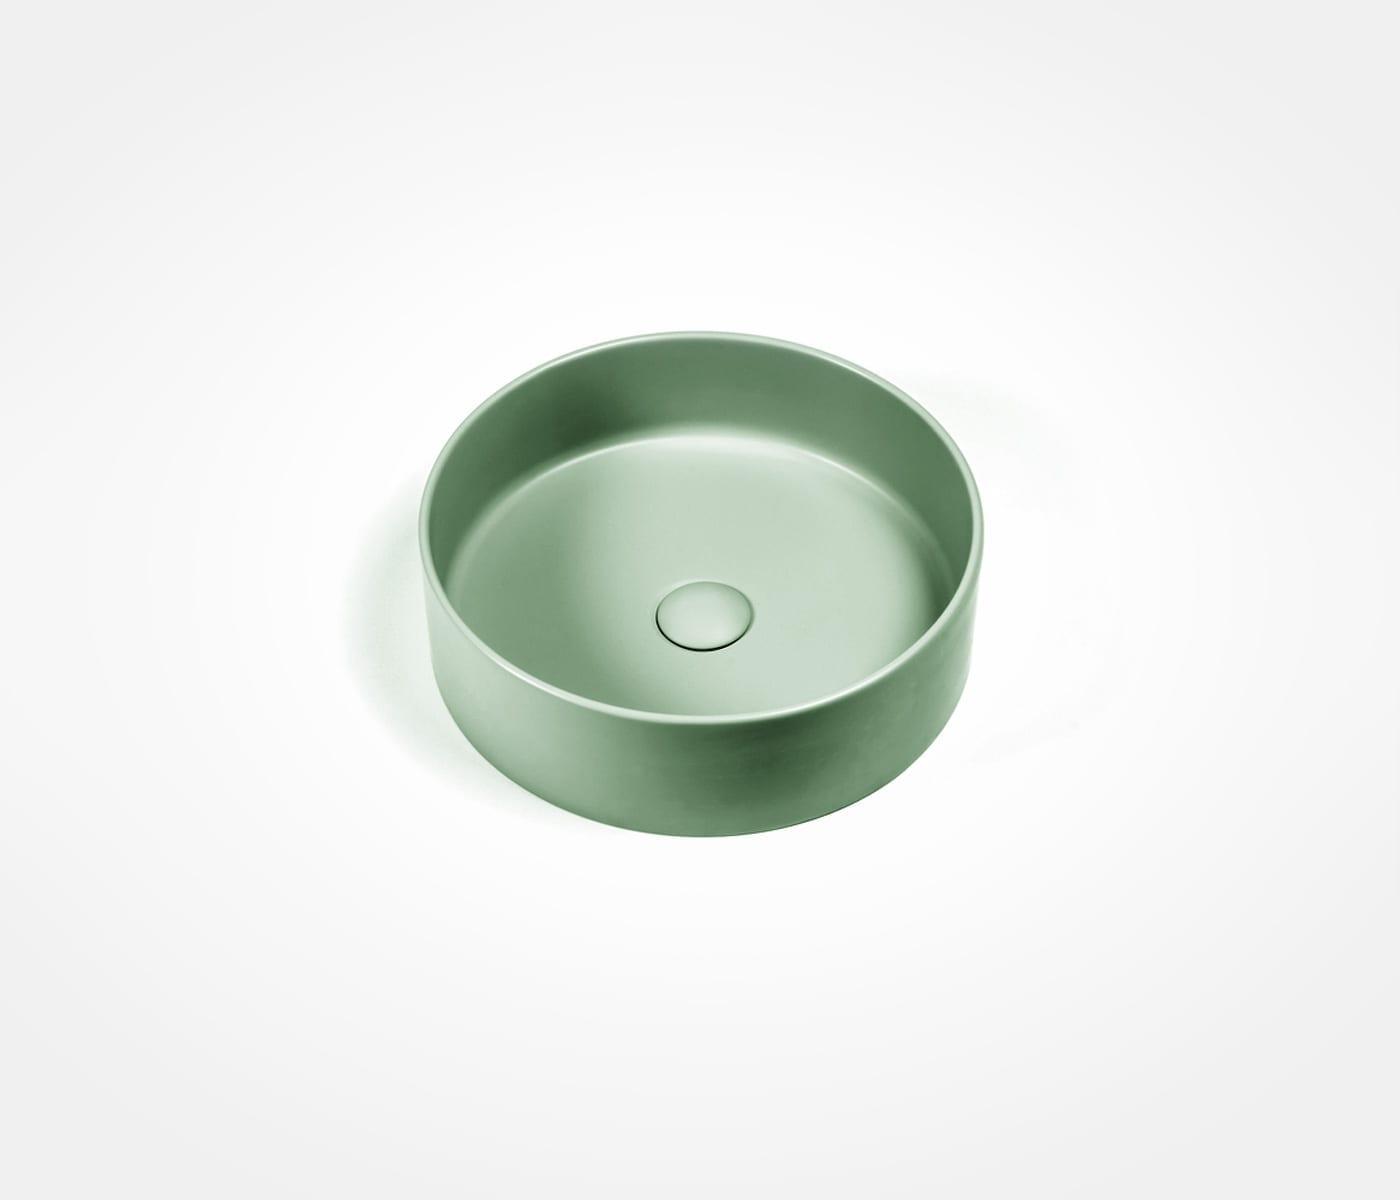 orb basin in aveo green victorian bathrooms